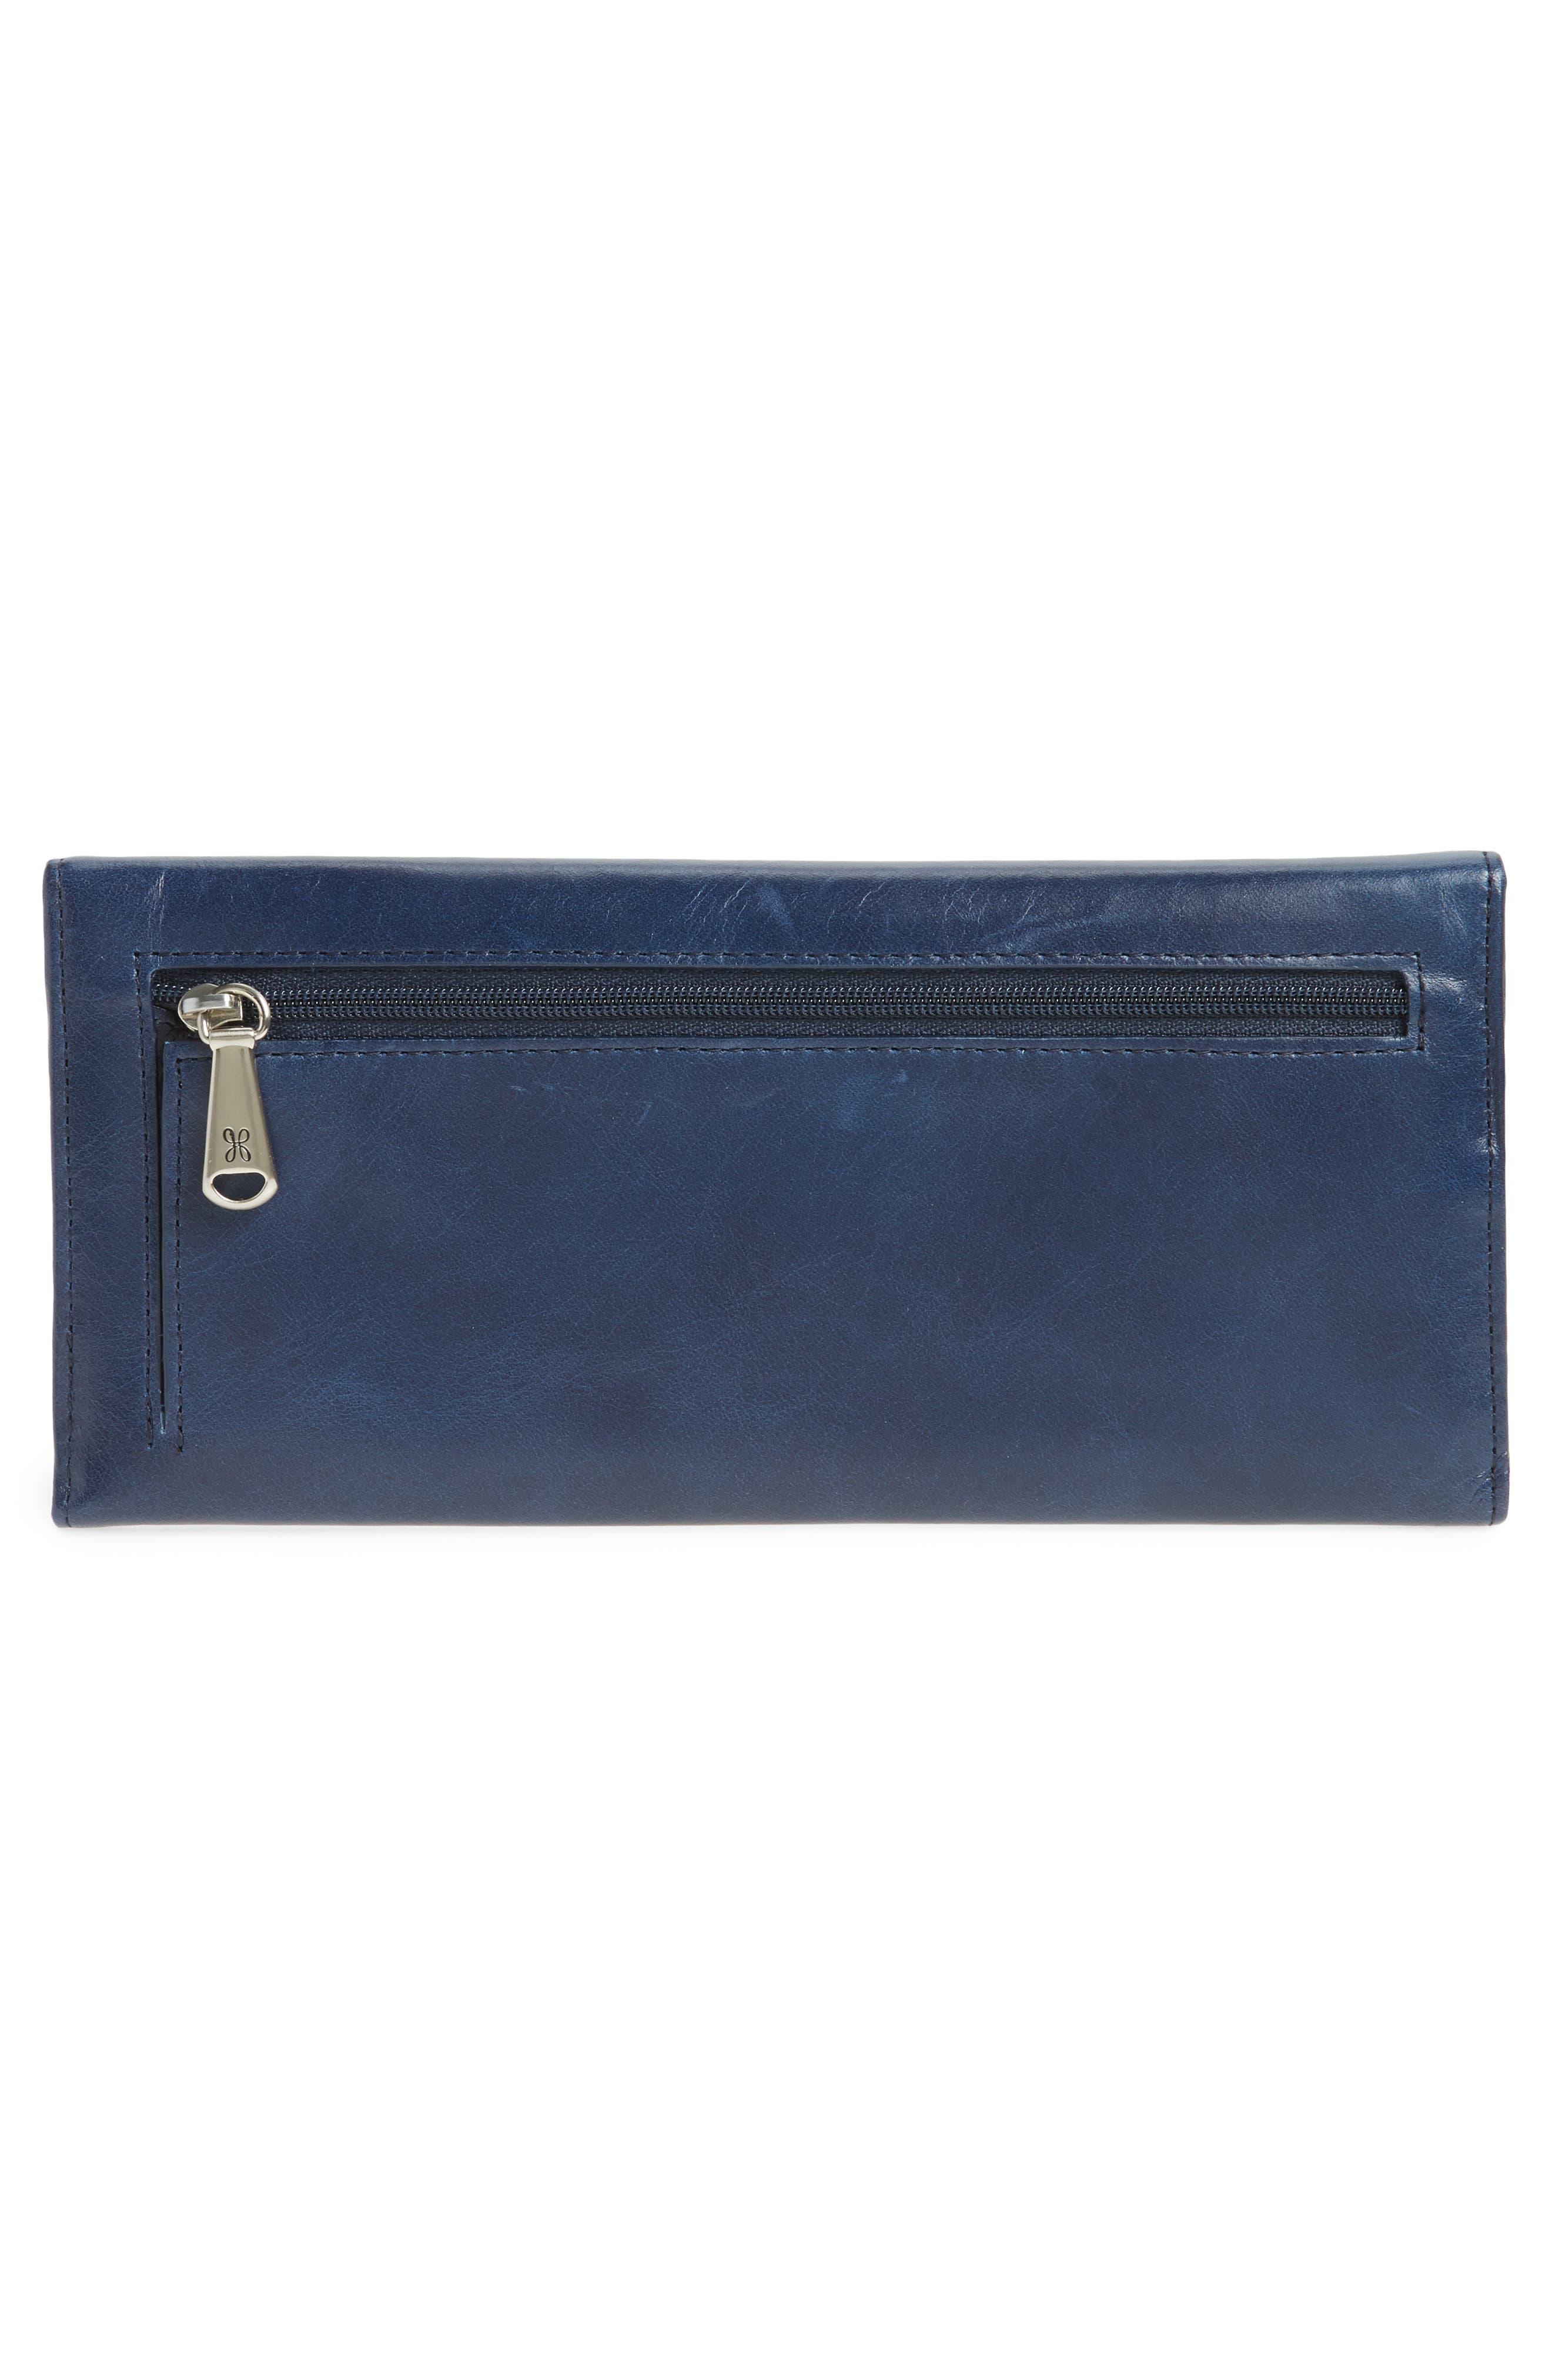 'Sadie' Leather Wallet,                             Alternate thumbnail 108, color,